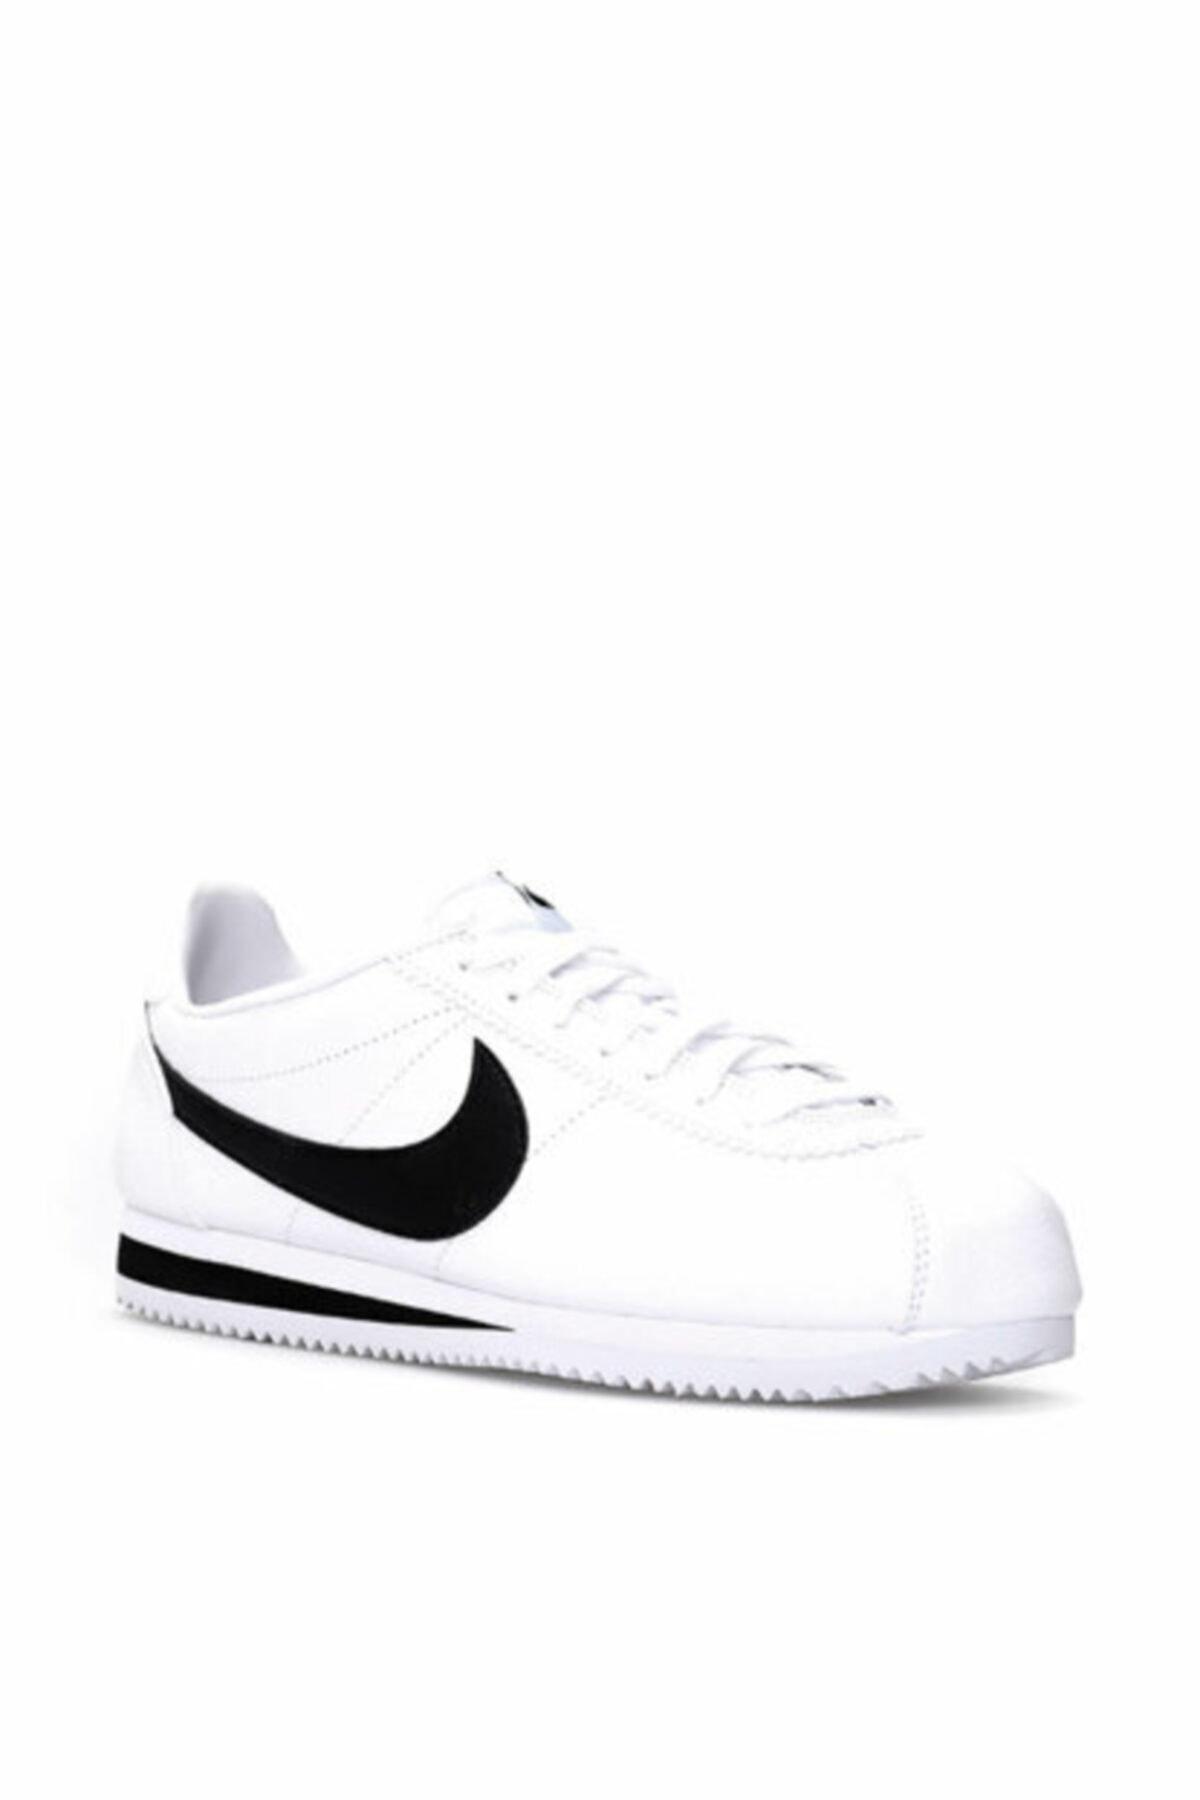 Nike Classic Cortez Leather 2